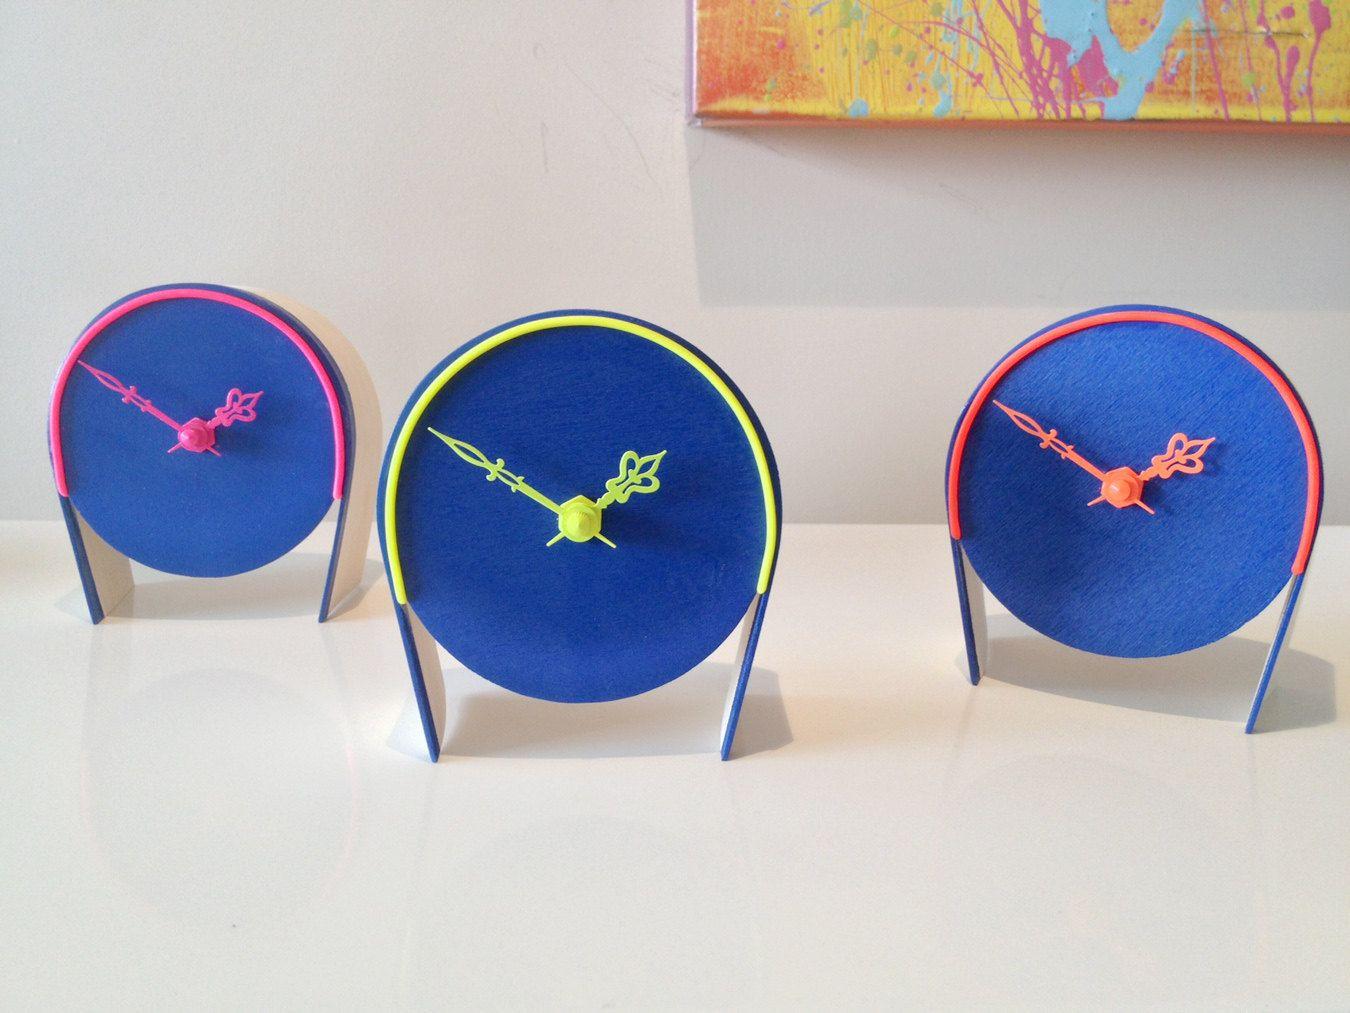 Neon clocks by Brandon LeNoir Neon clock, Neon, Clock